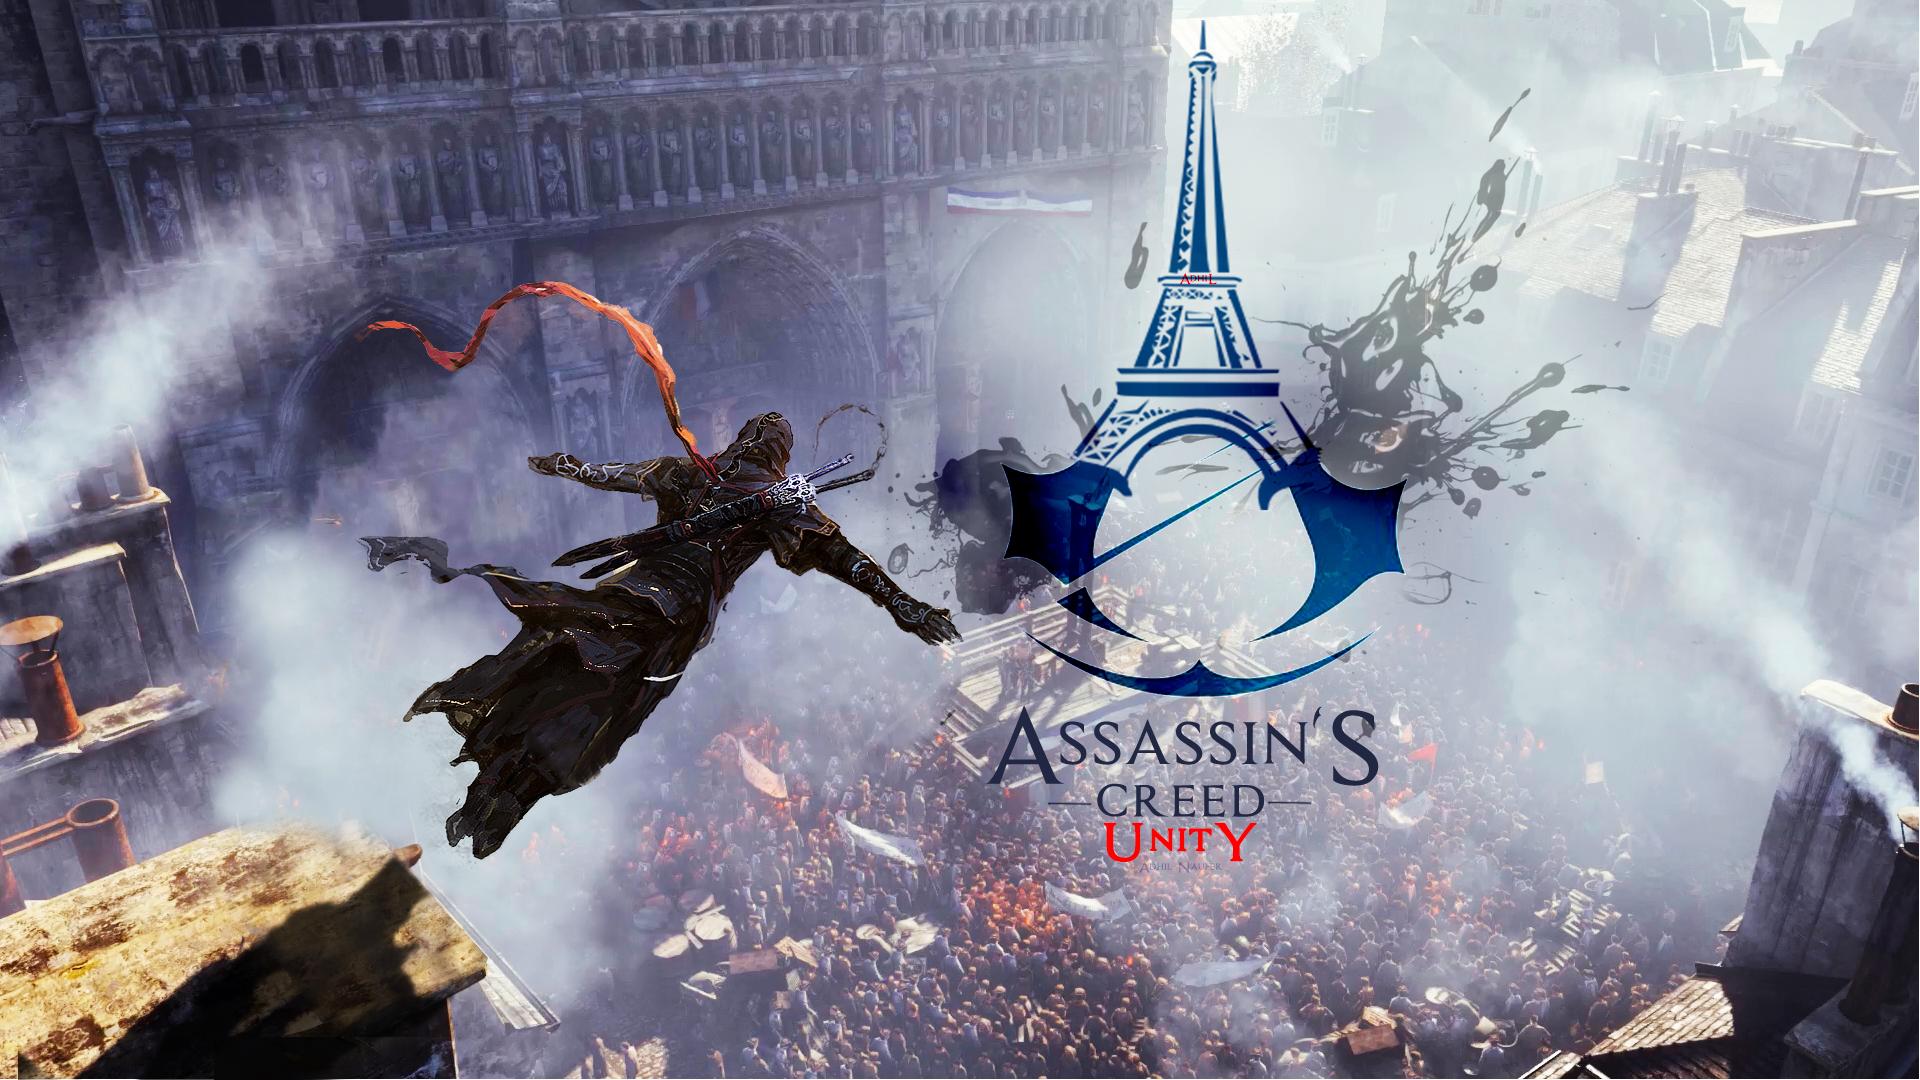 Assassin  s Creed dejtingsajt helt gratis Ottawa dejtingsajter